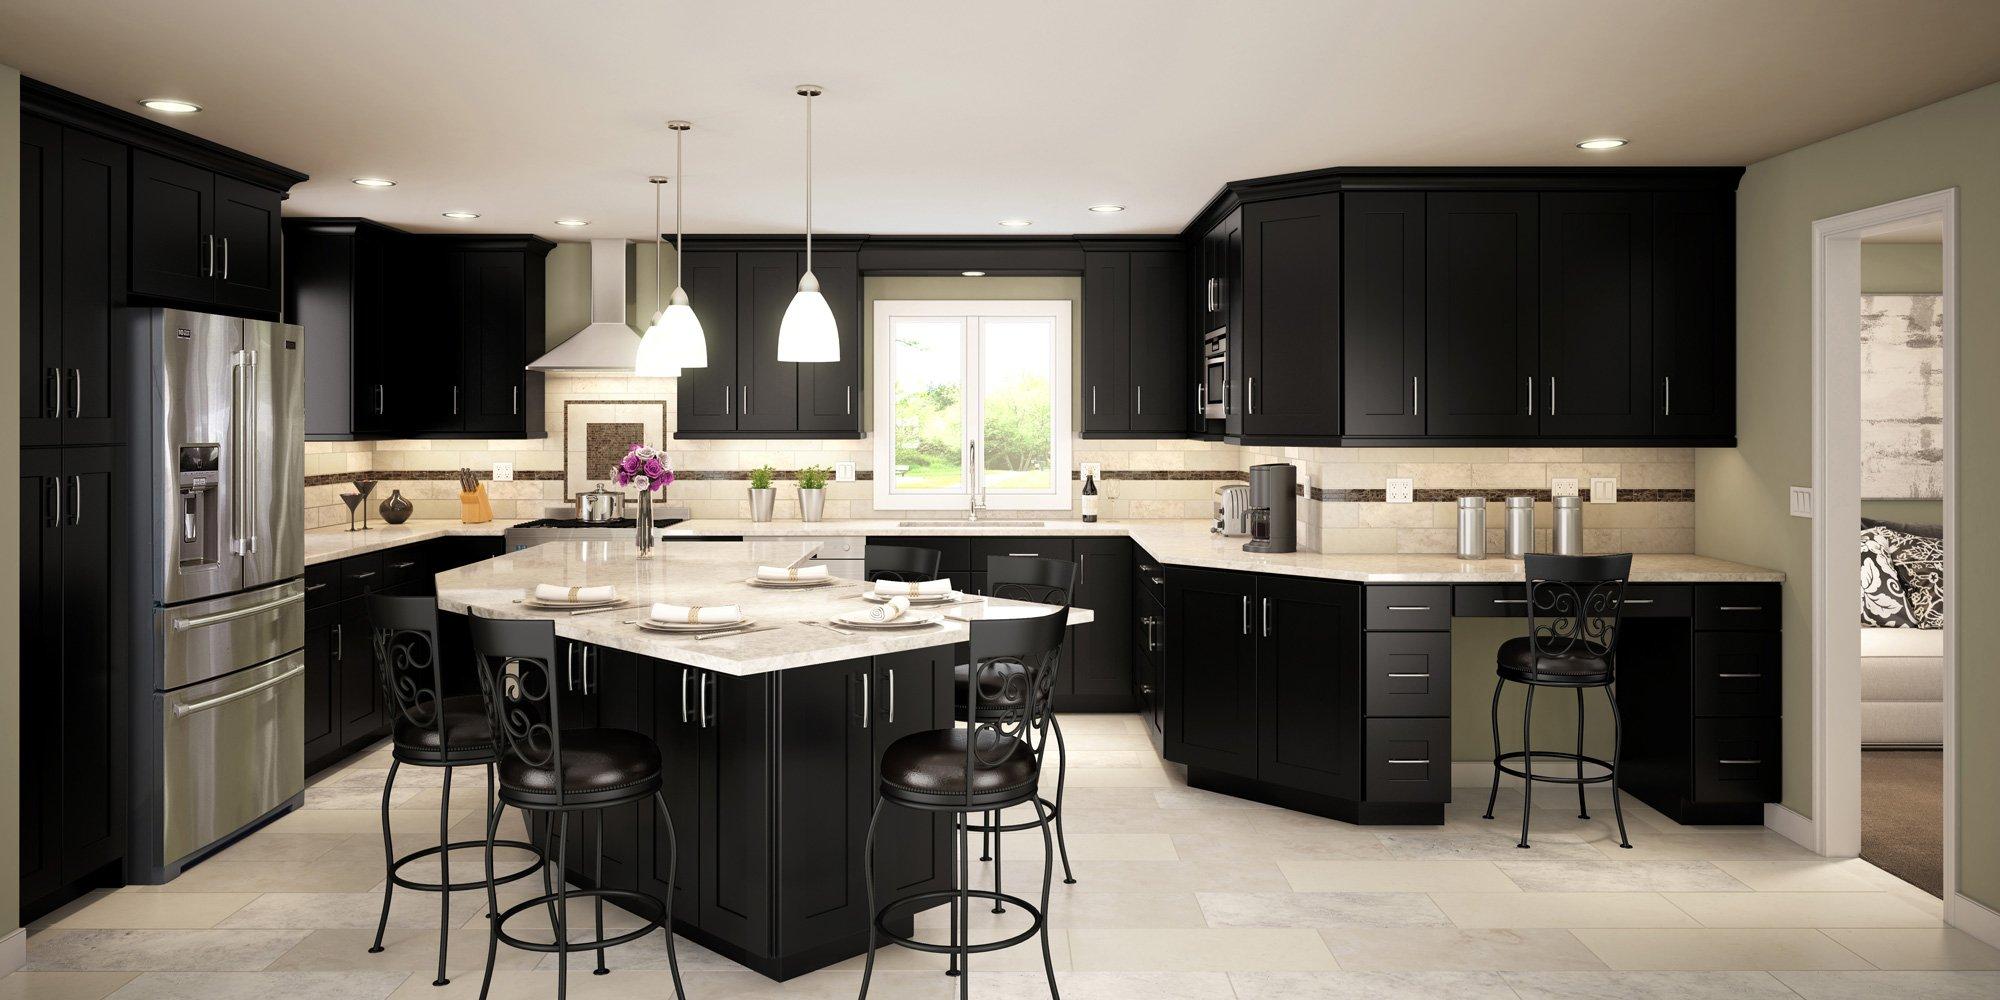 Cubitac Cabinets   Home Art Tile Kitchen and Bath